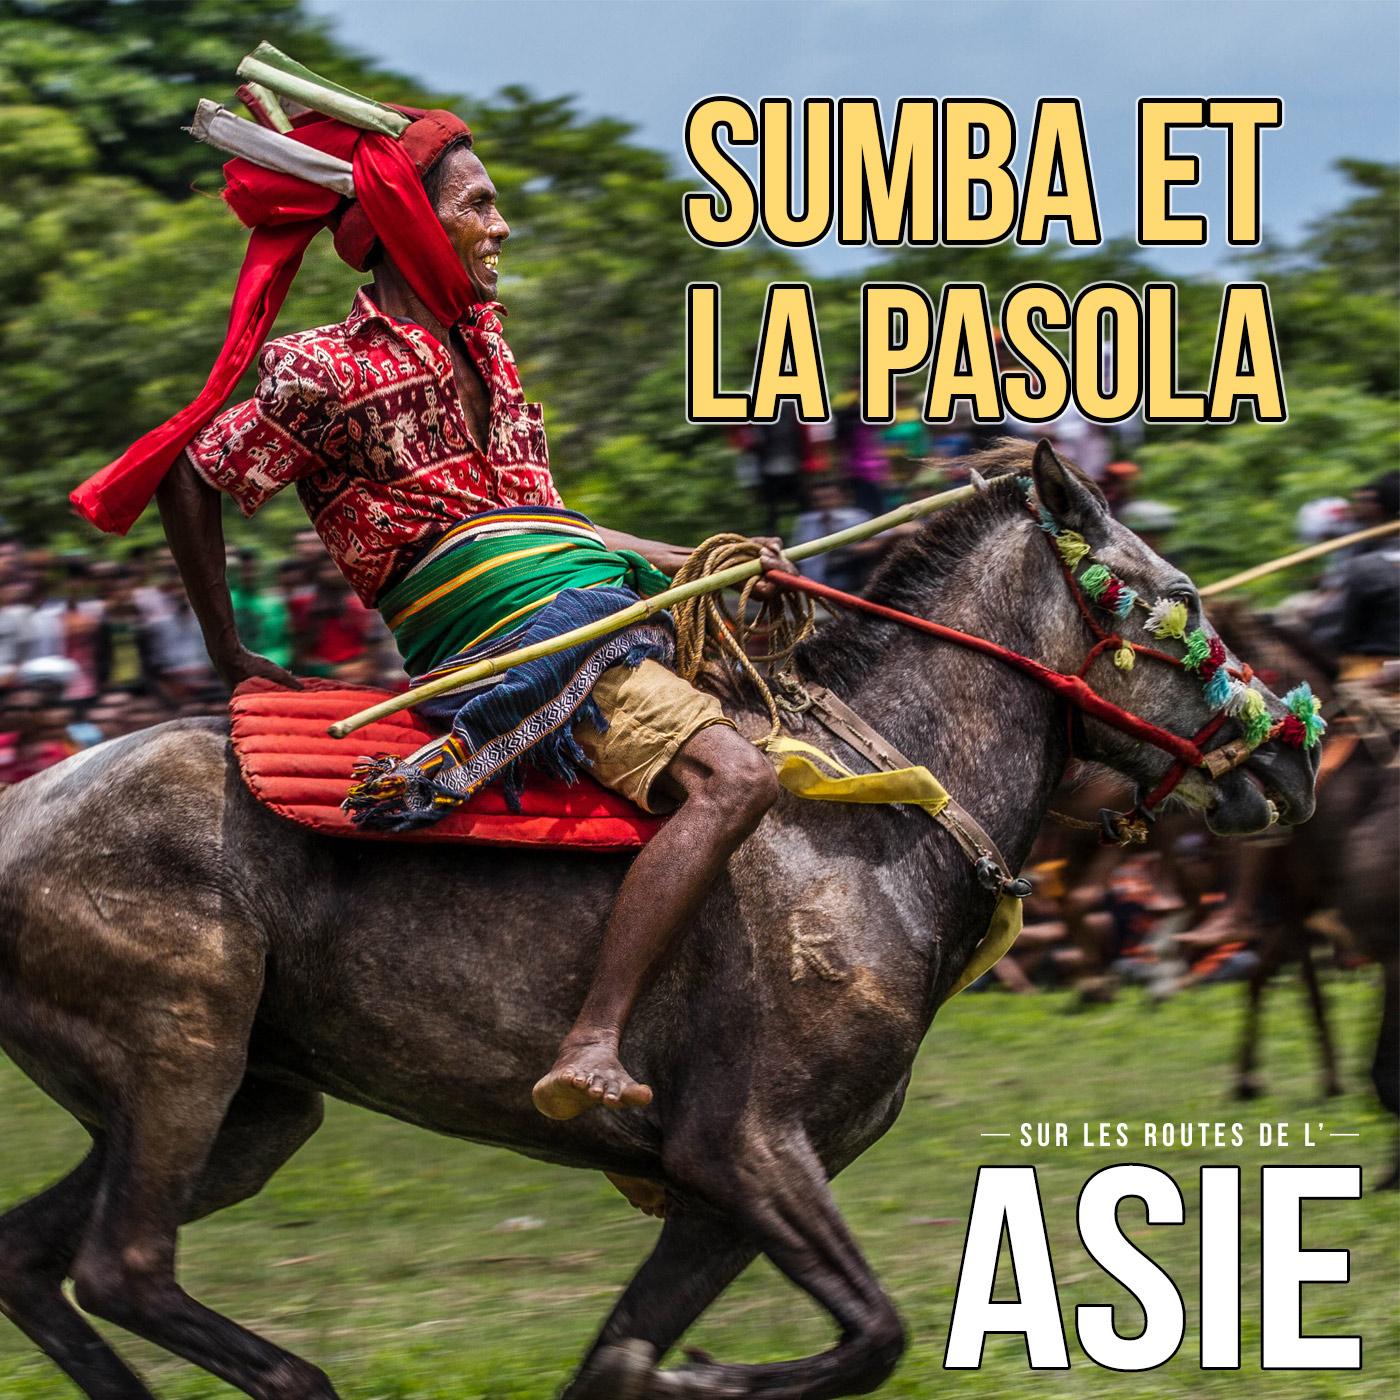 Sumba et la Pasola (Indonésie)